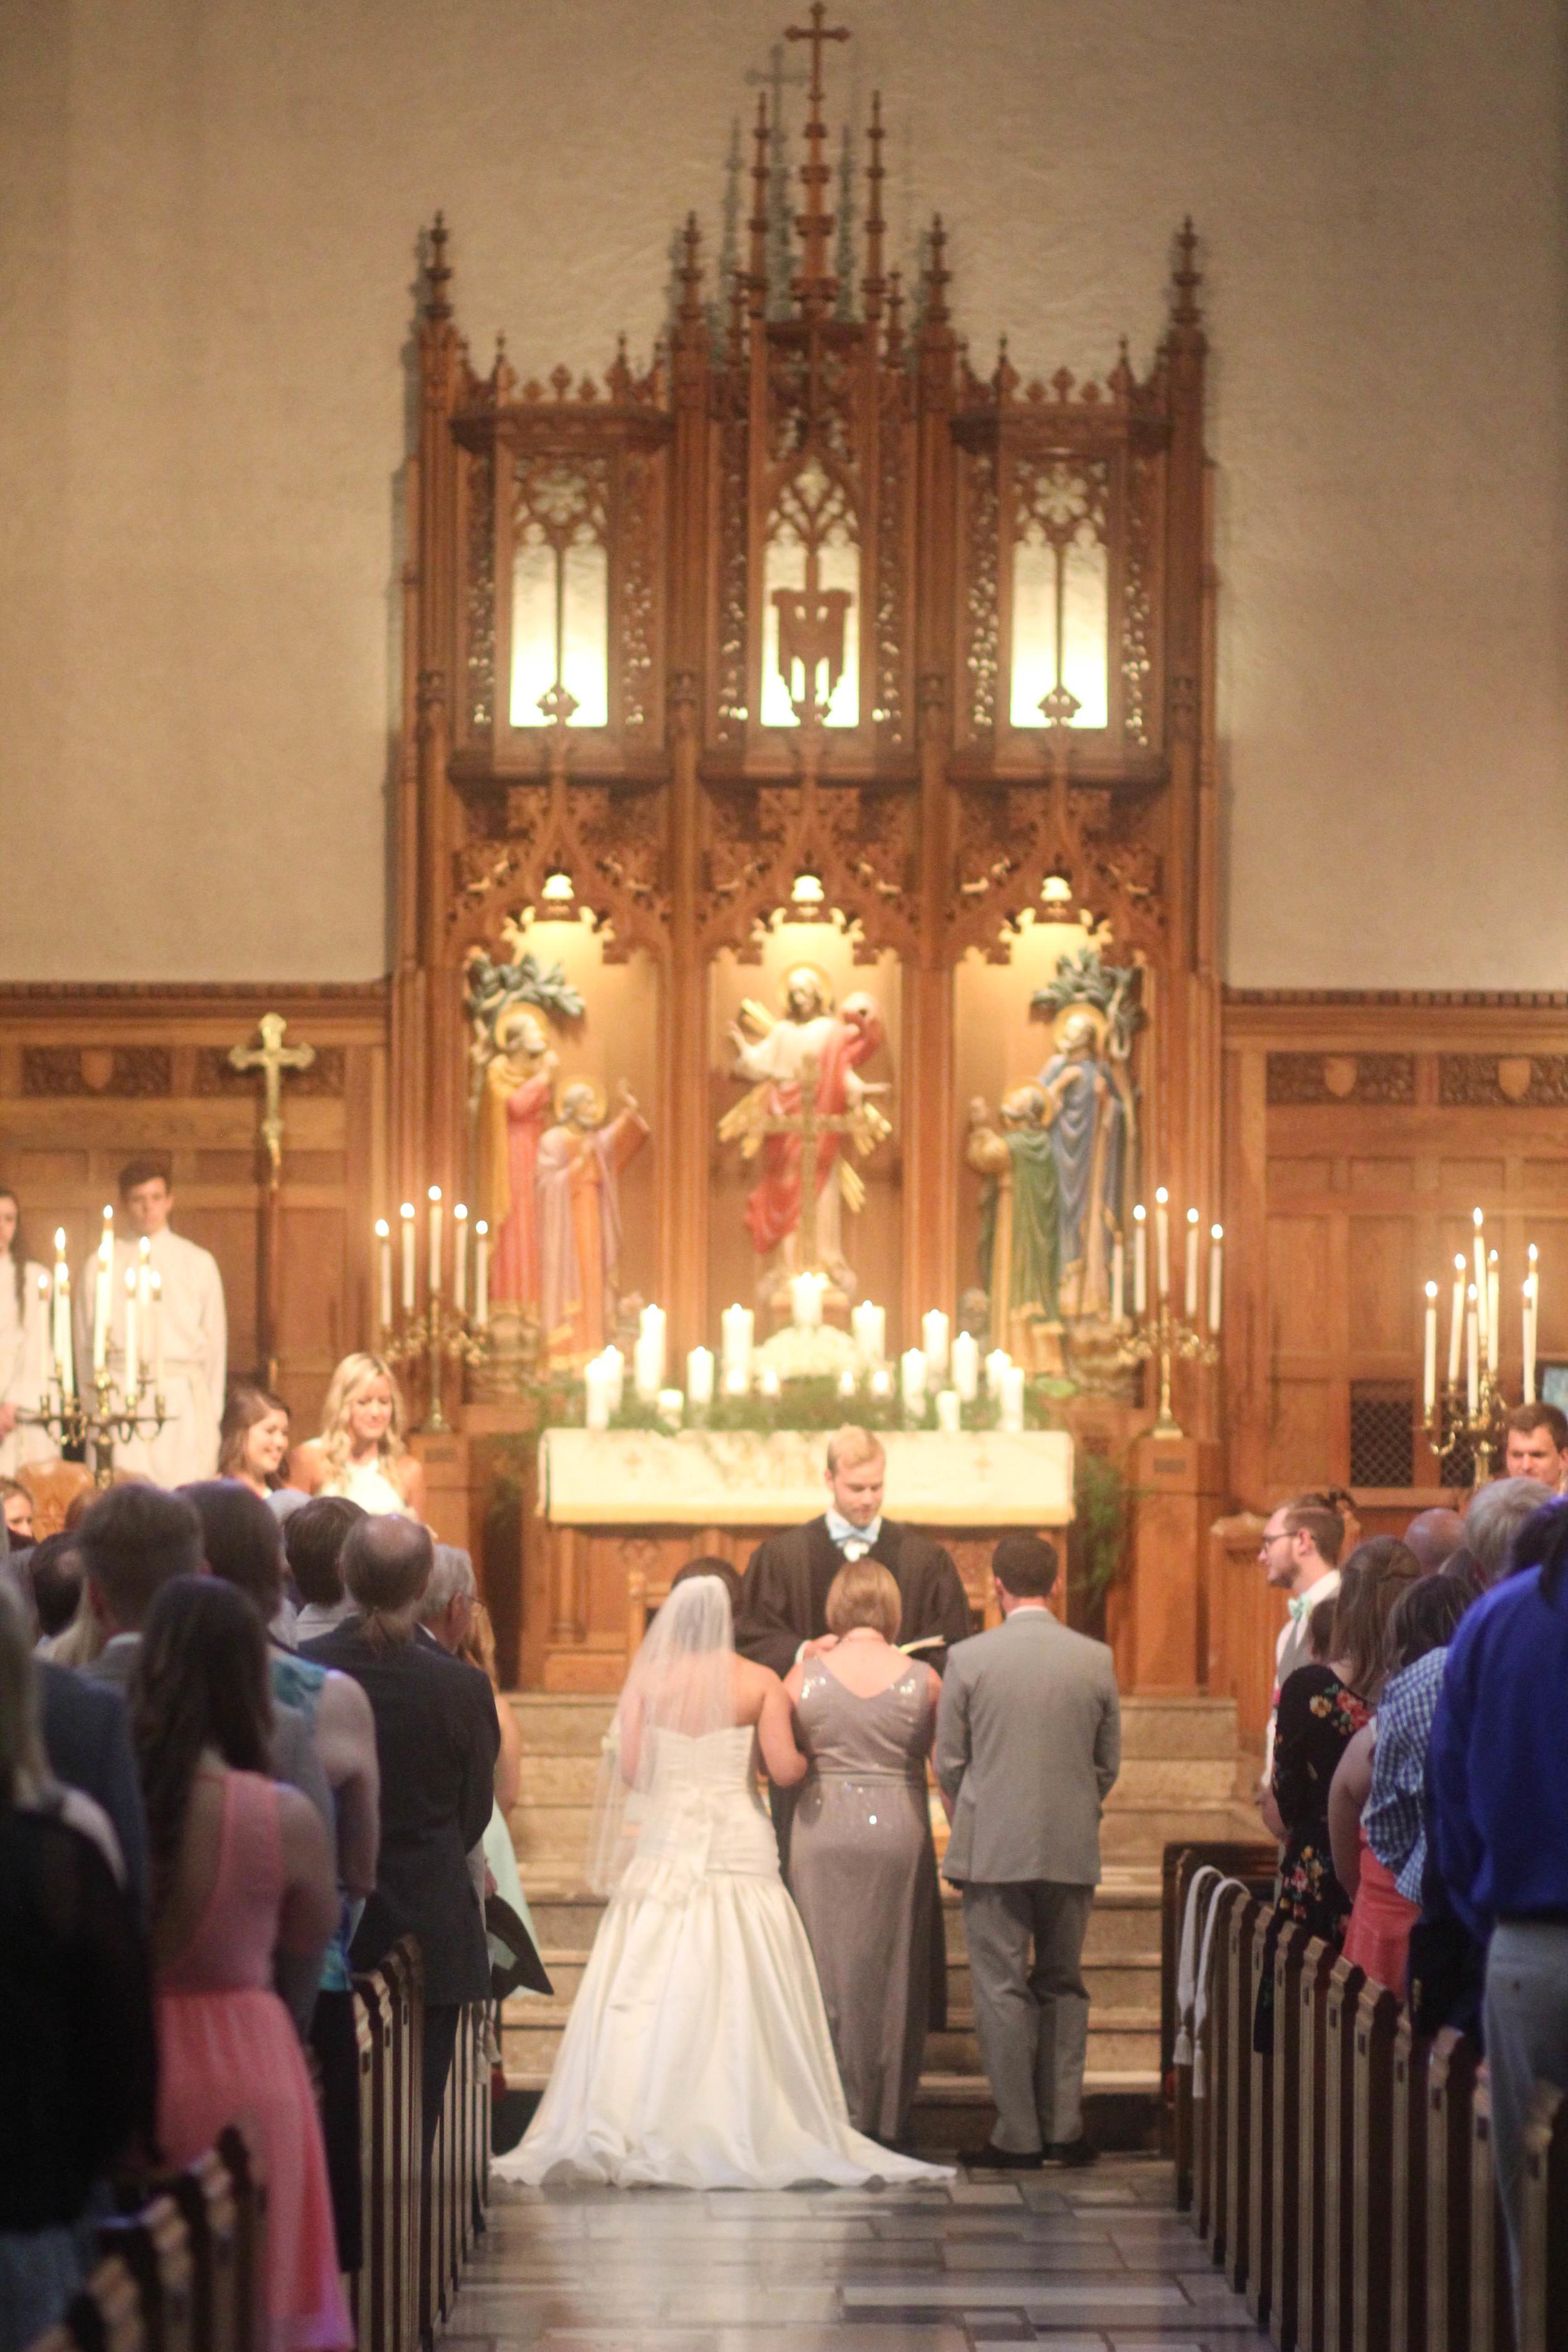 family-ceremony-149.jpg